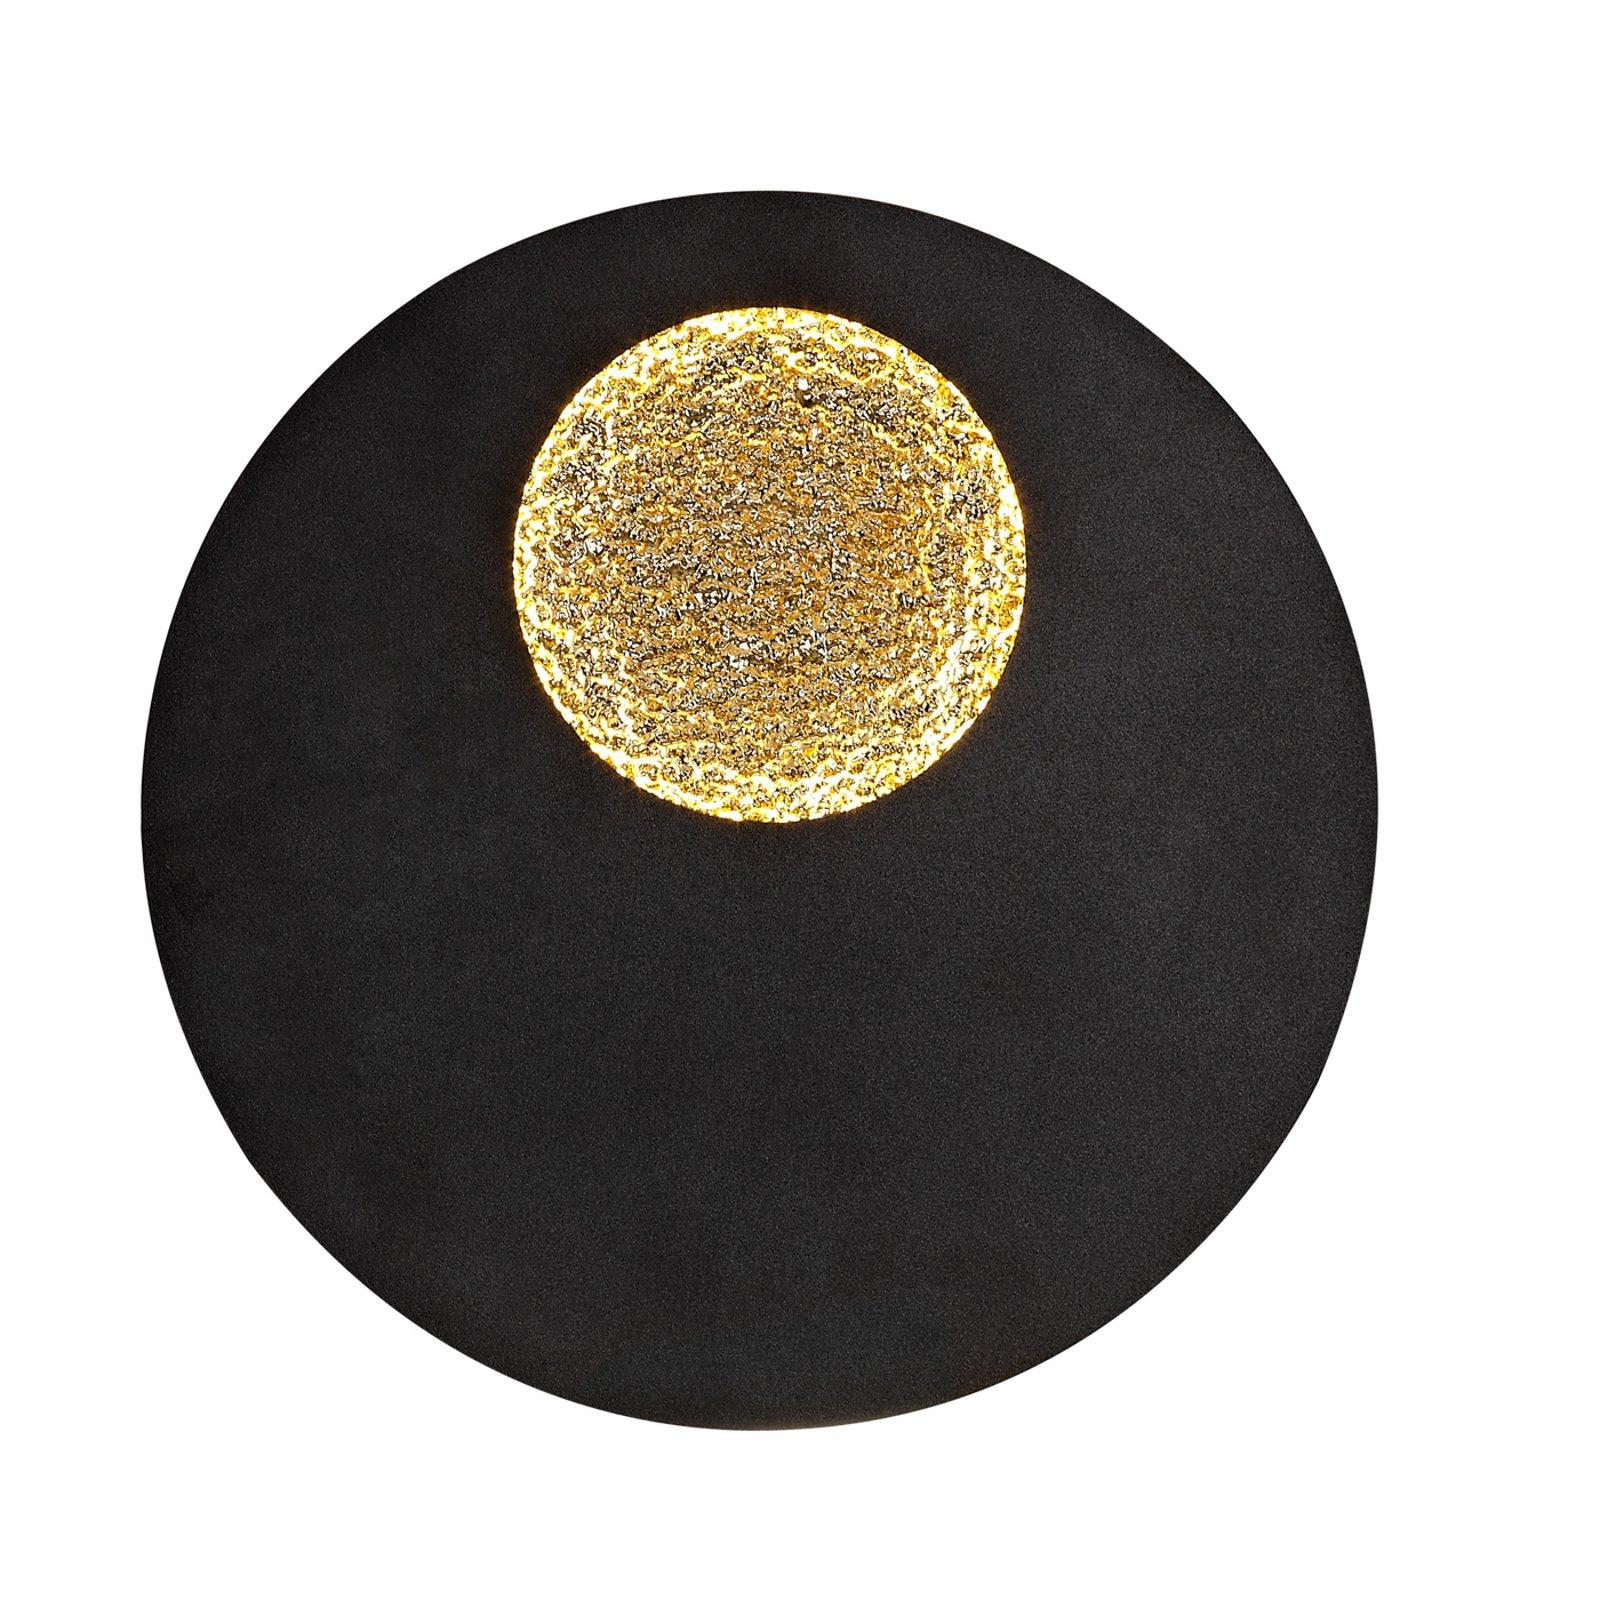 Jupiter LED-vegglampe, svart/gull, rund